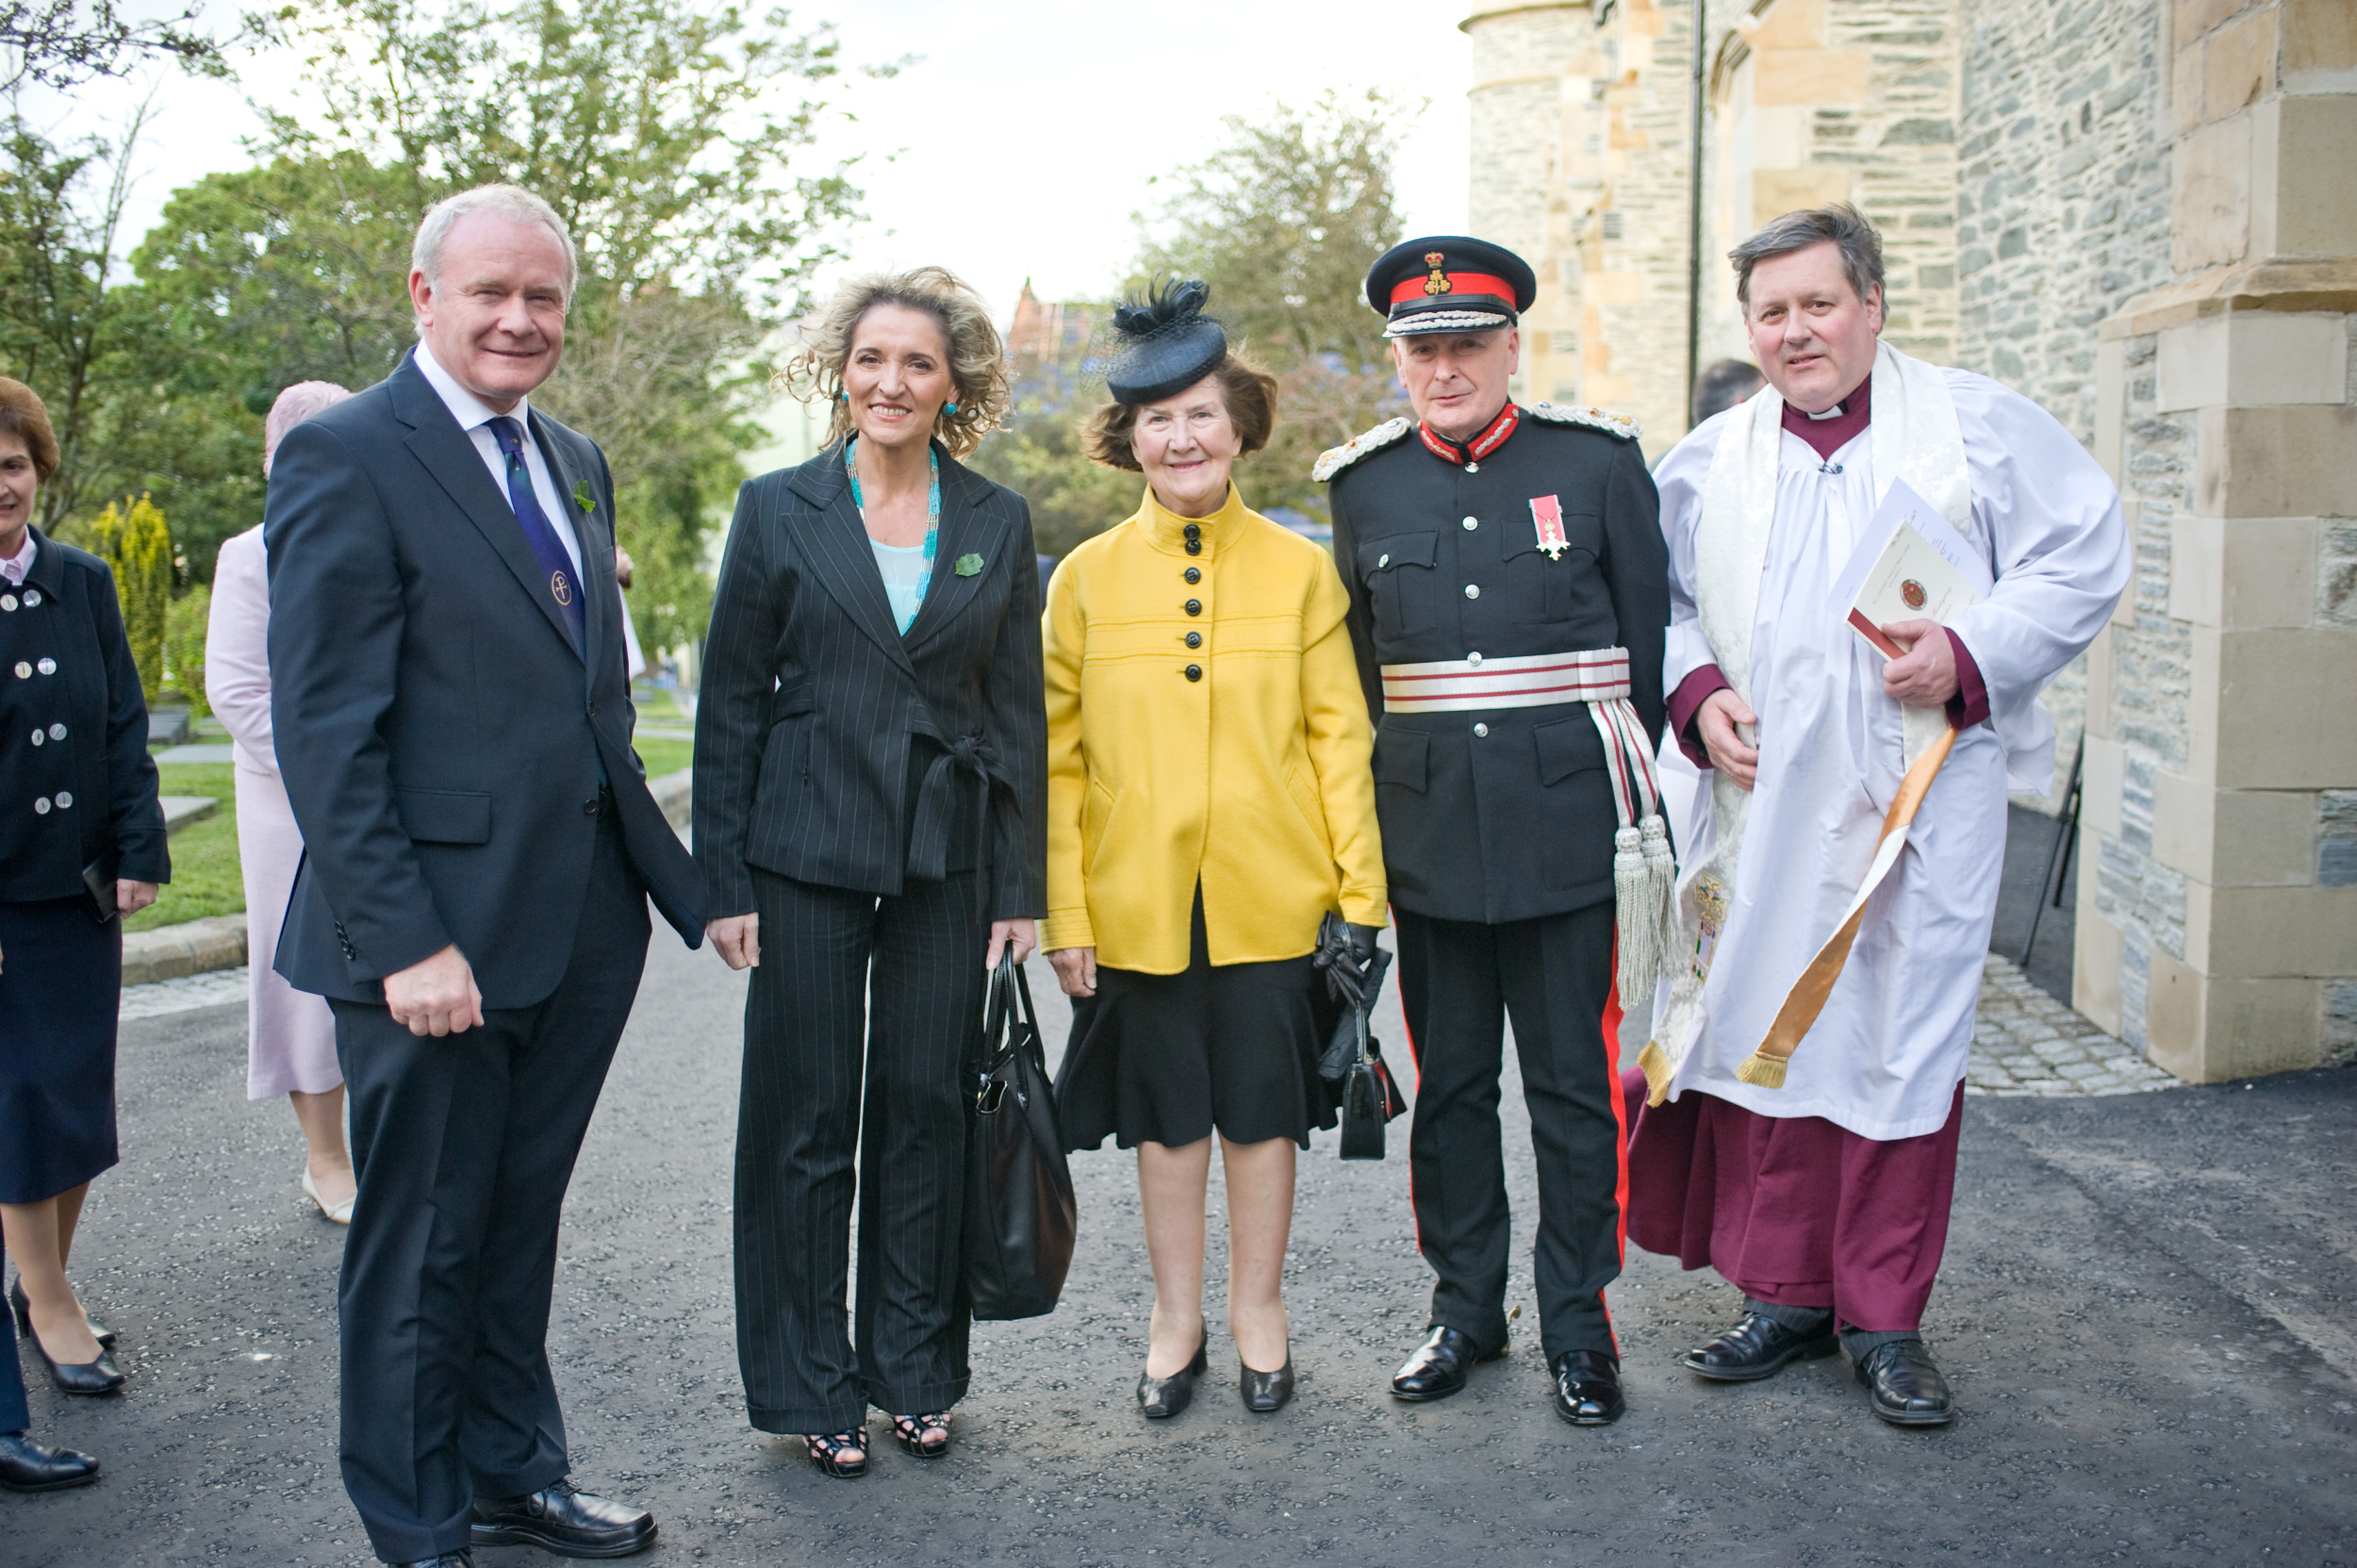 VIPs Attend St Columb's Dedication - following multi million refurbishment